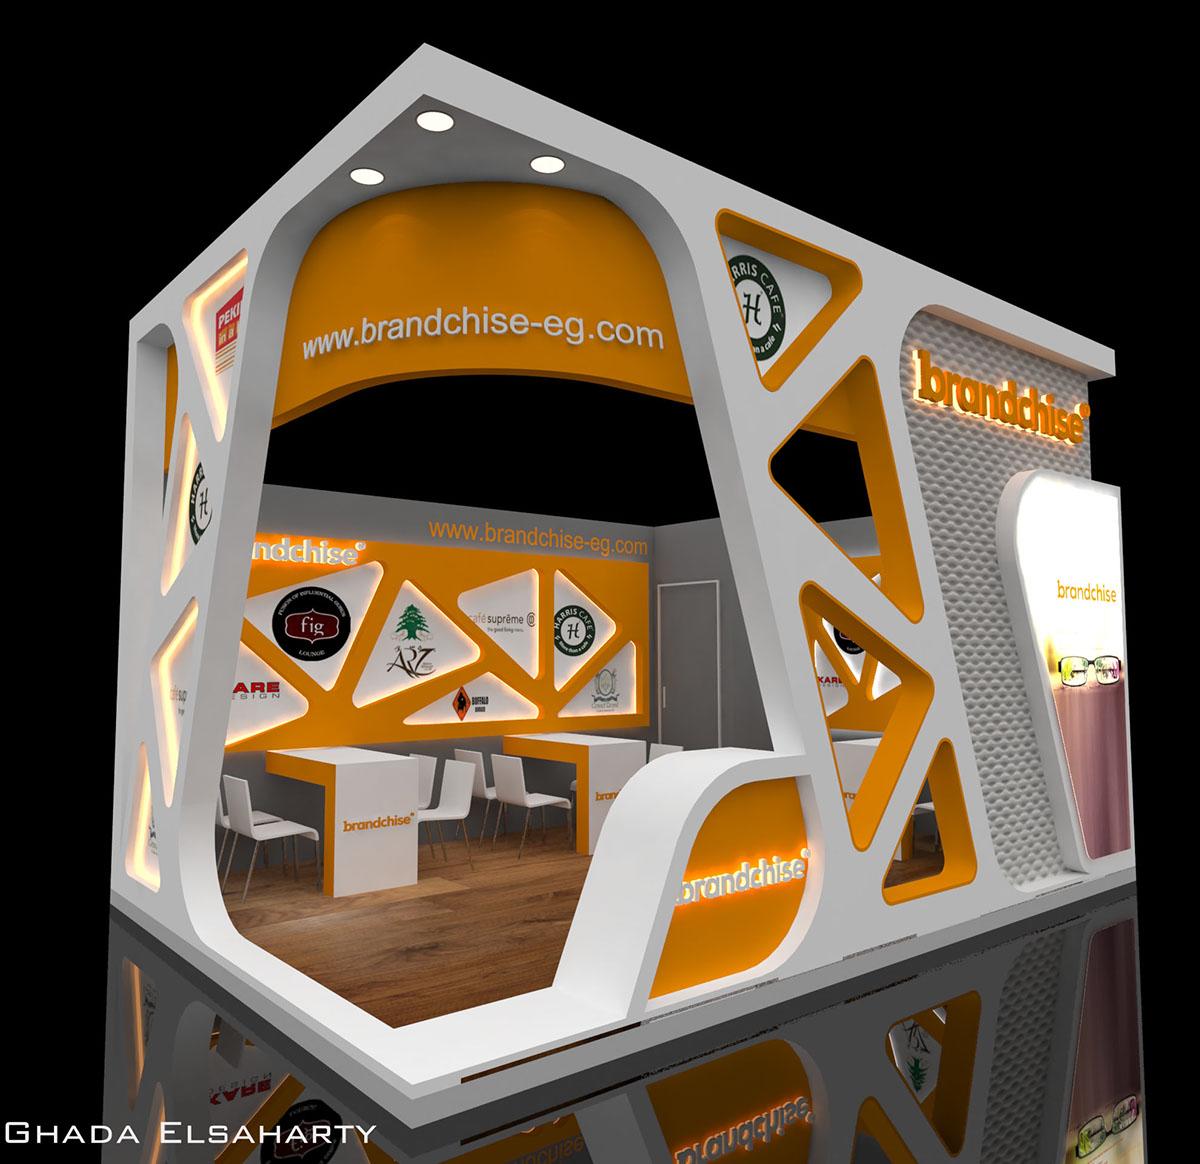 Exhibition Stand Design Behance : Brandchise booth design on behance